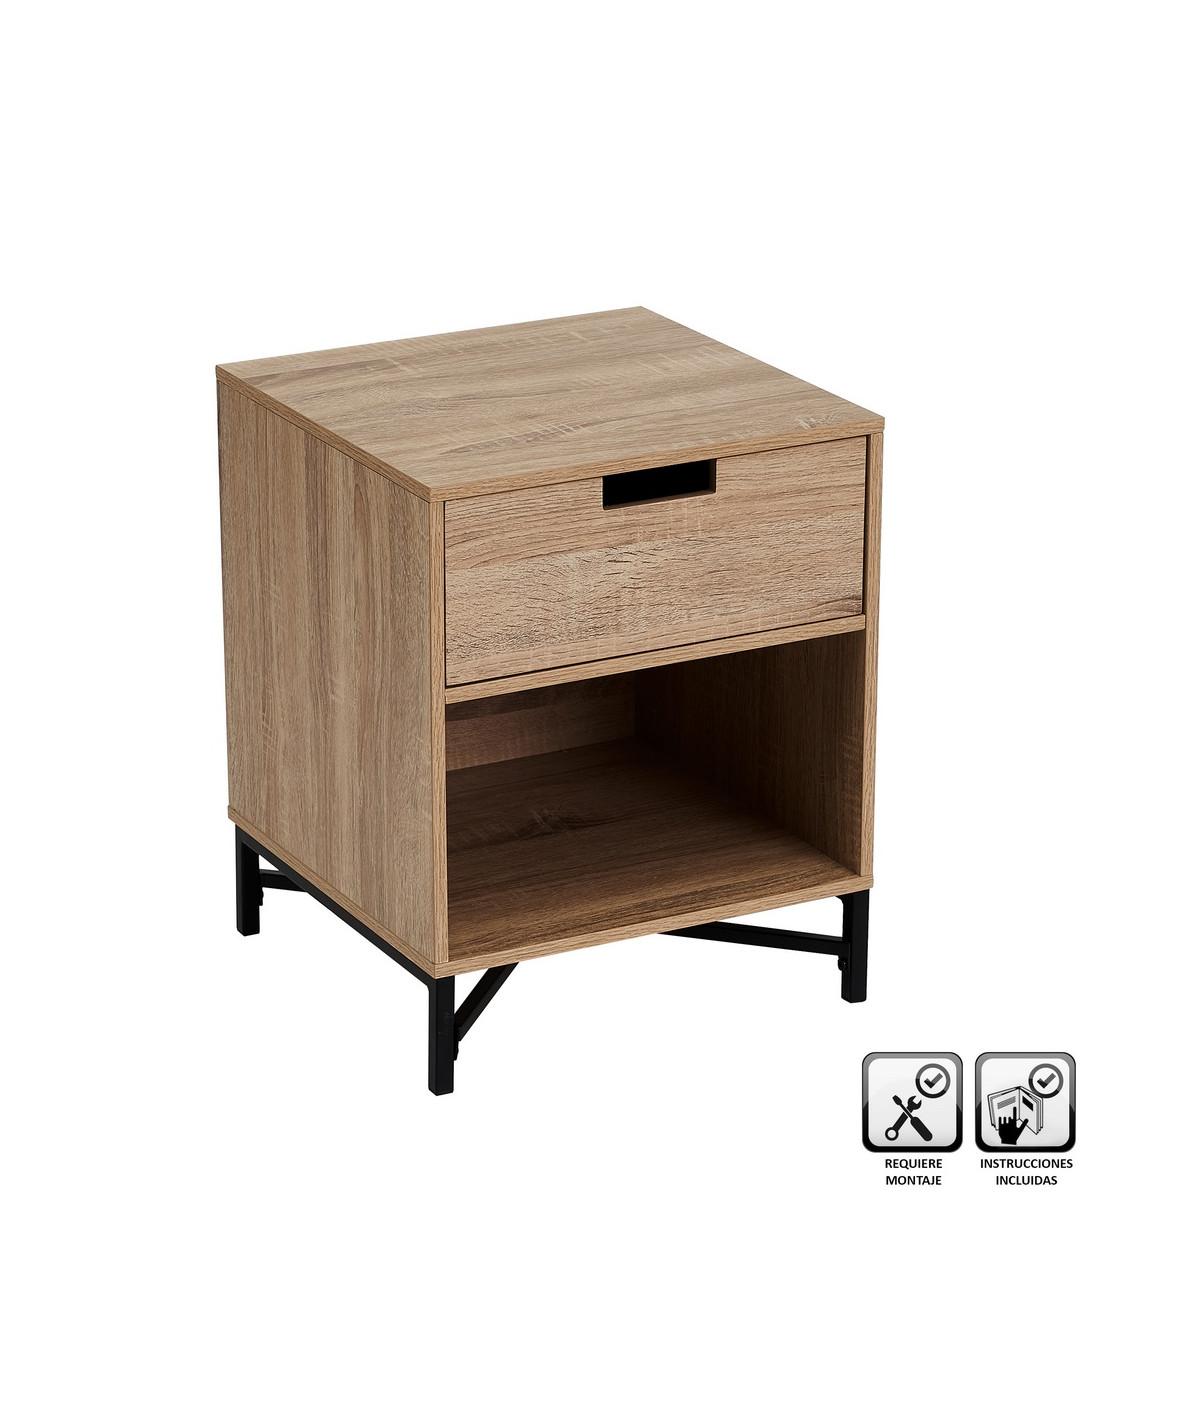 Table de chevet carré |YESDEKO